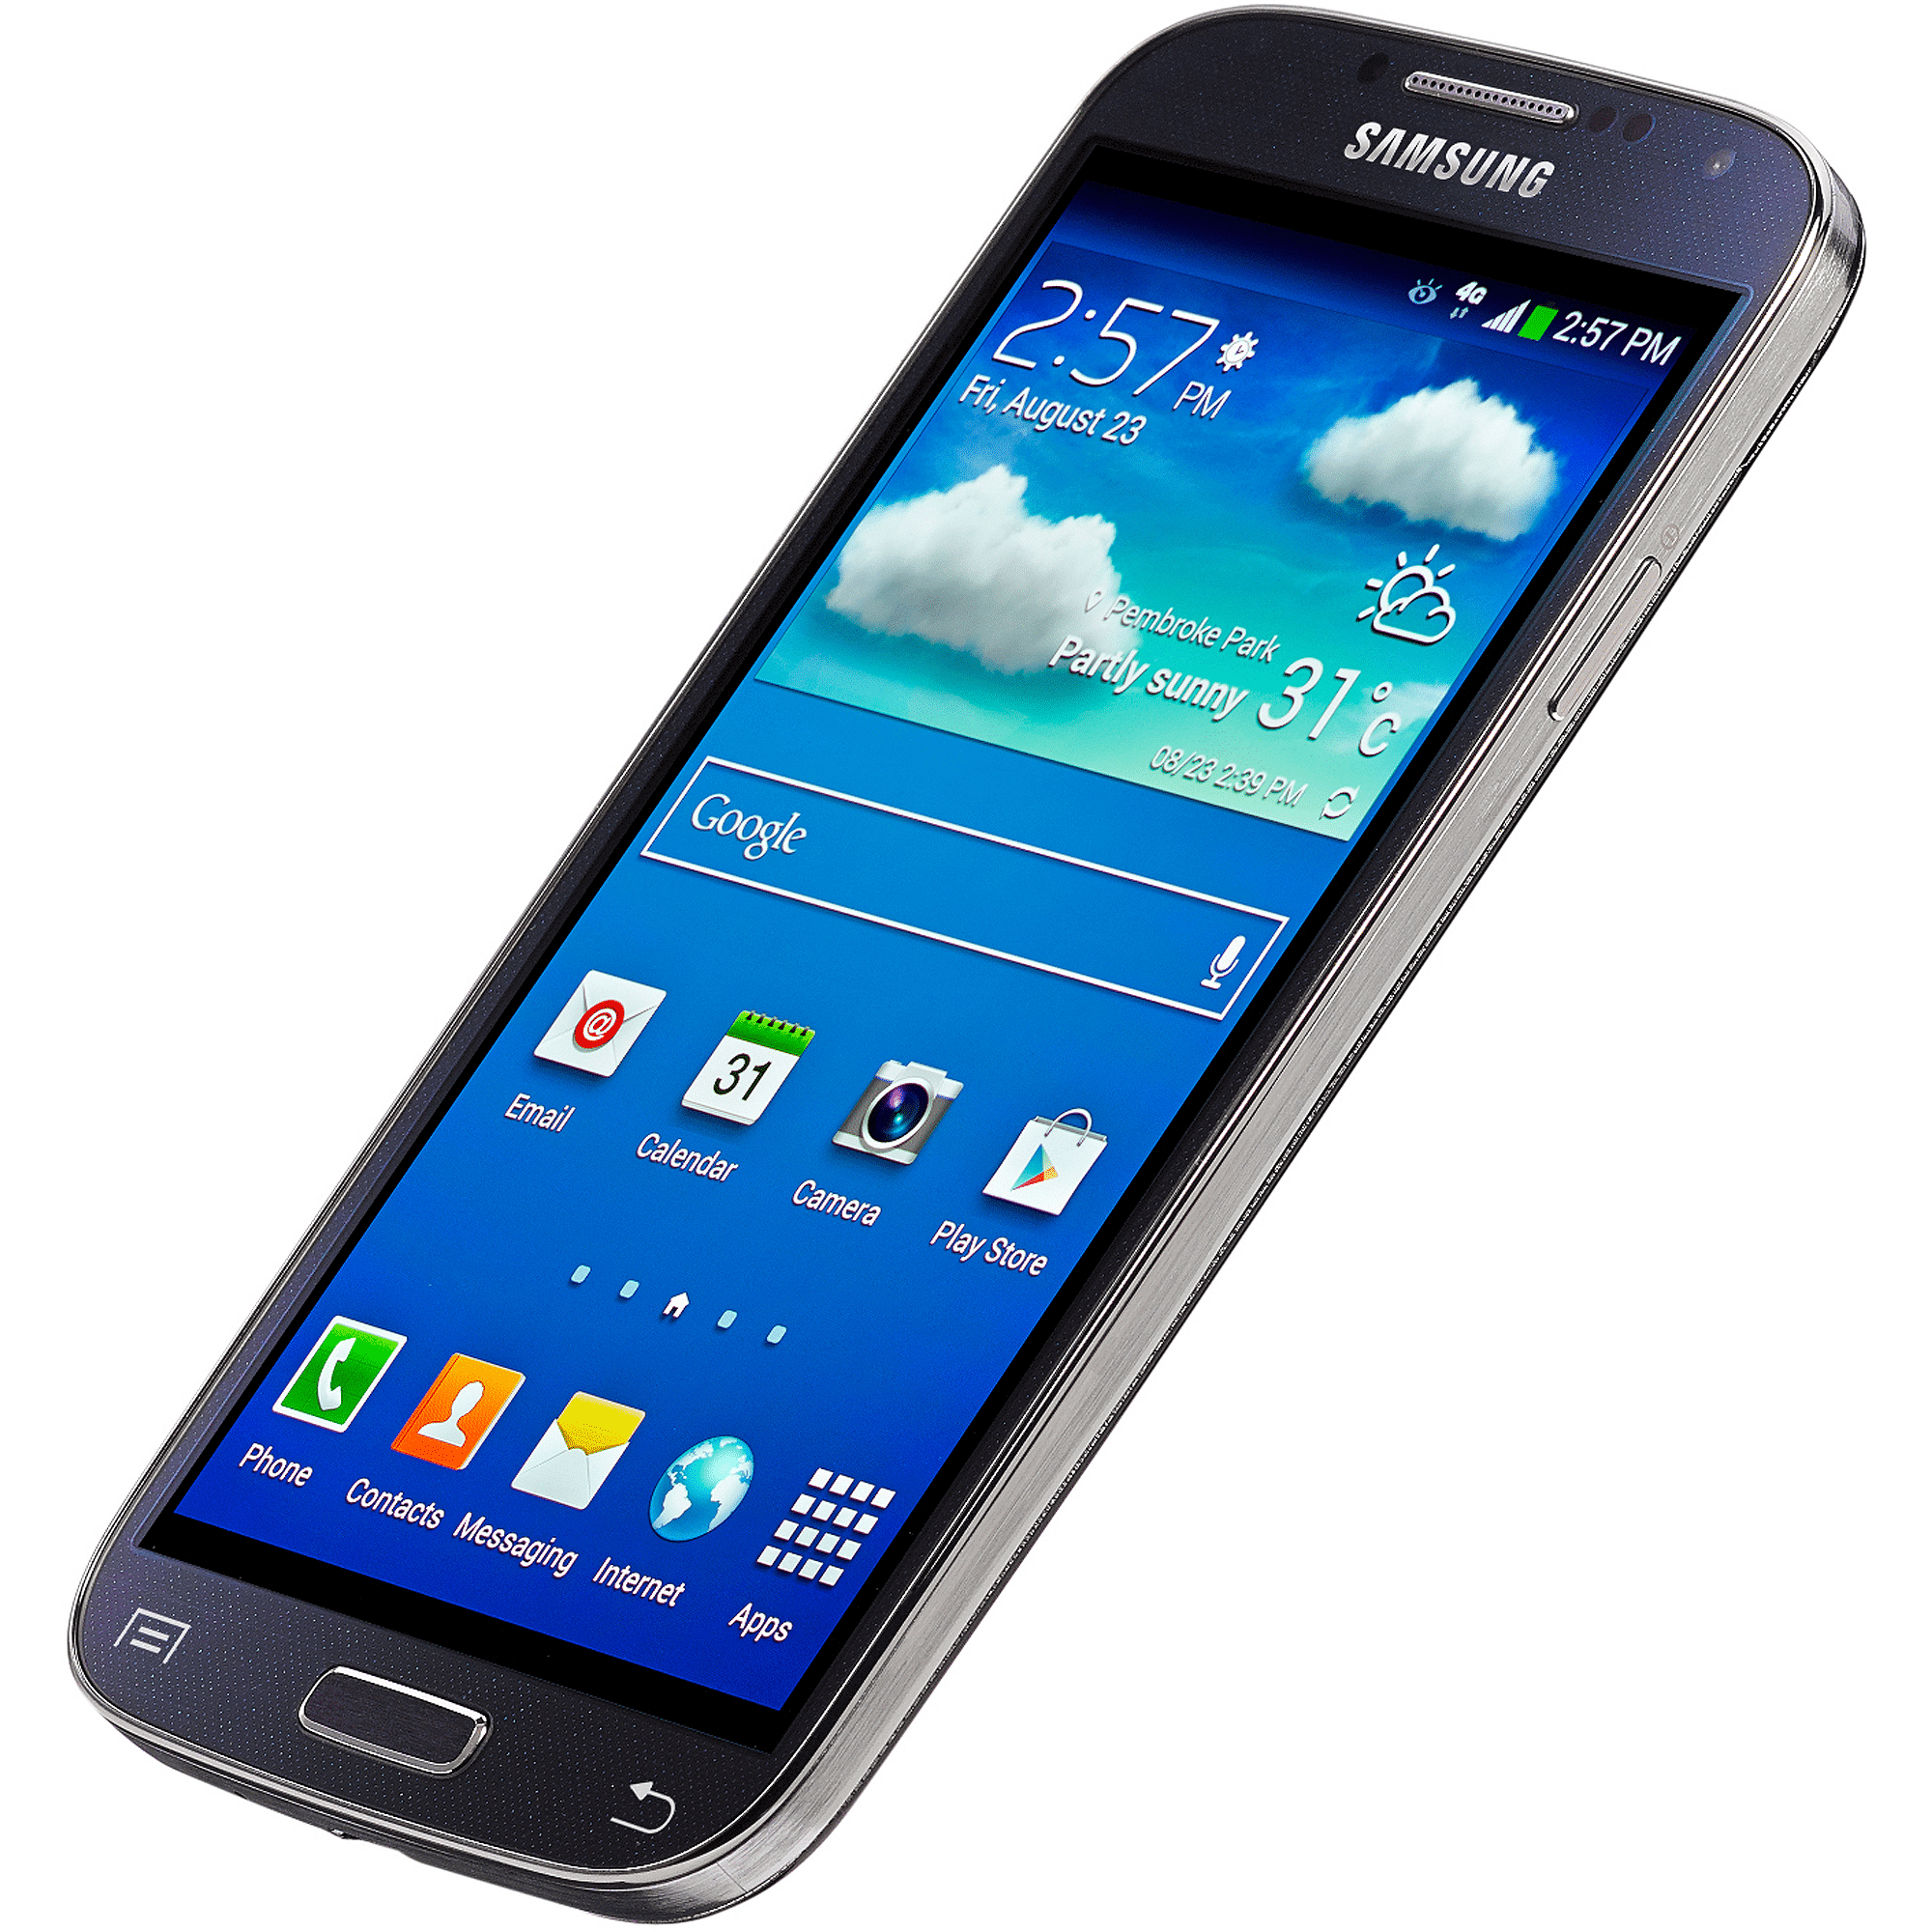 Install Android 7.1.1 Nougat ResurrectionRemix ROM on Galaxy S4 LTE I9505 1